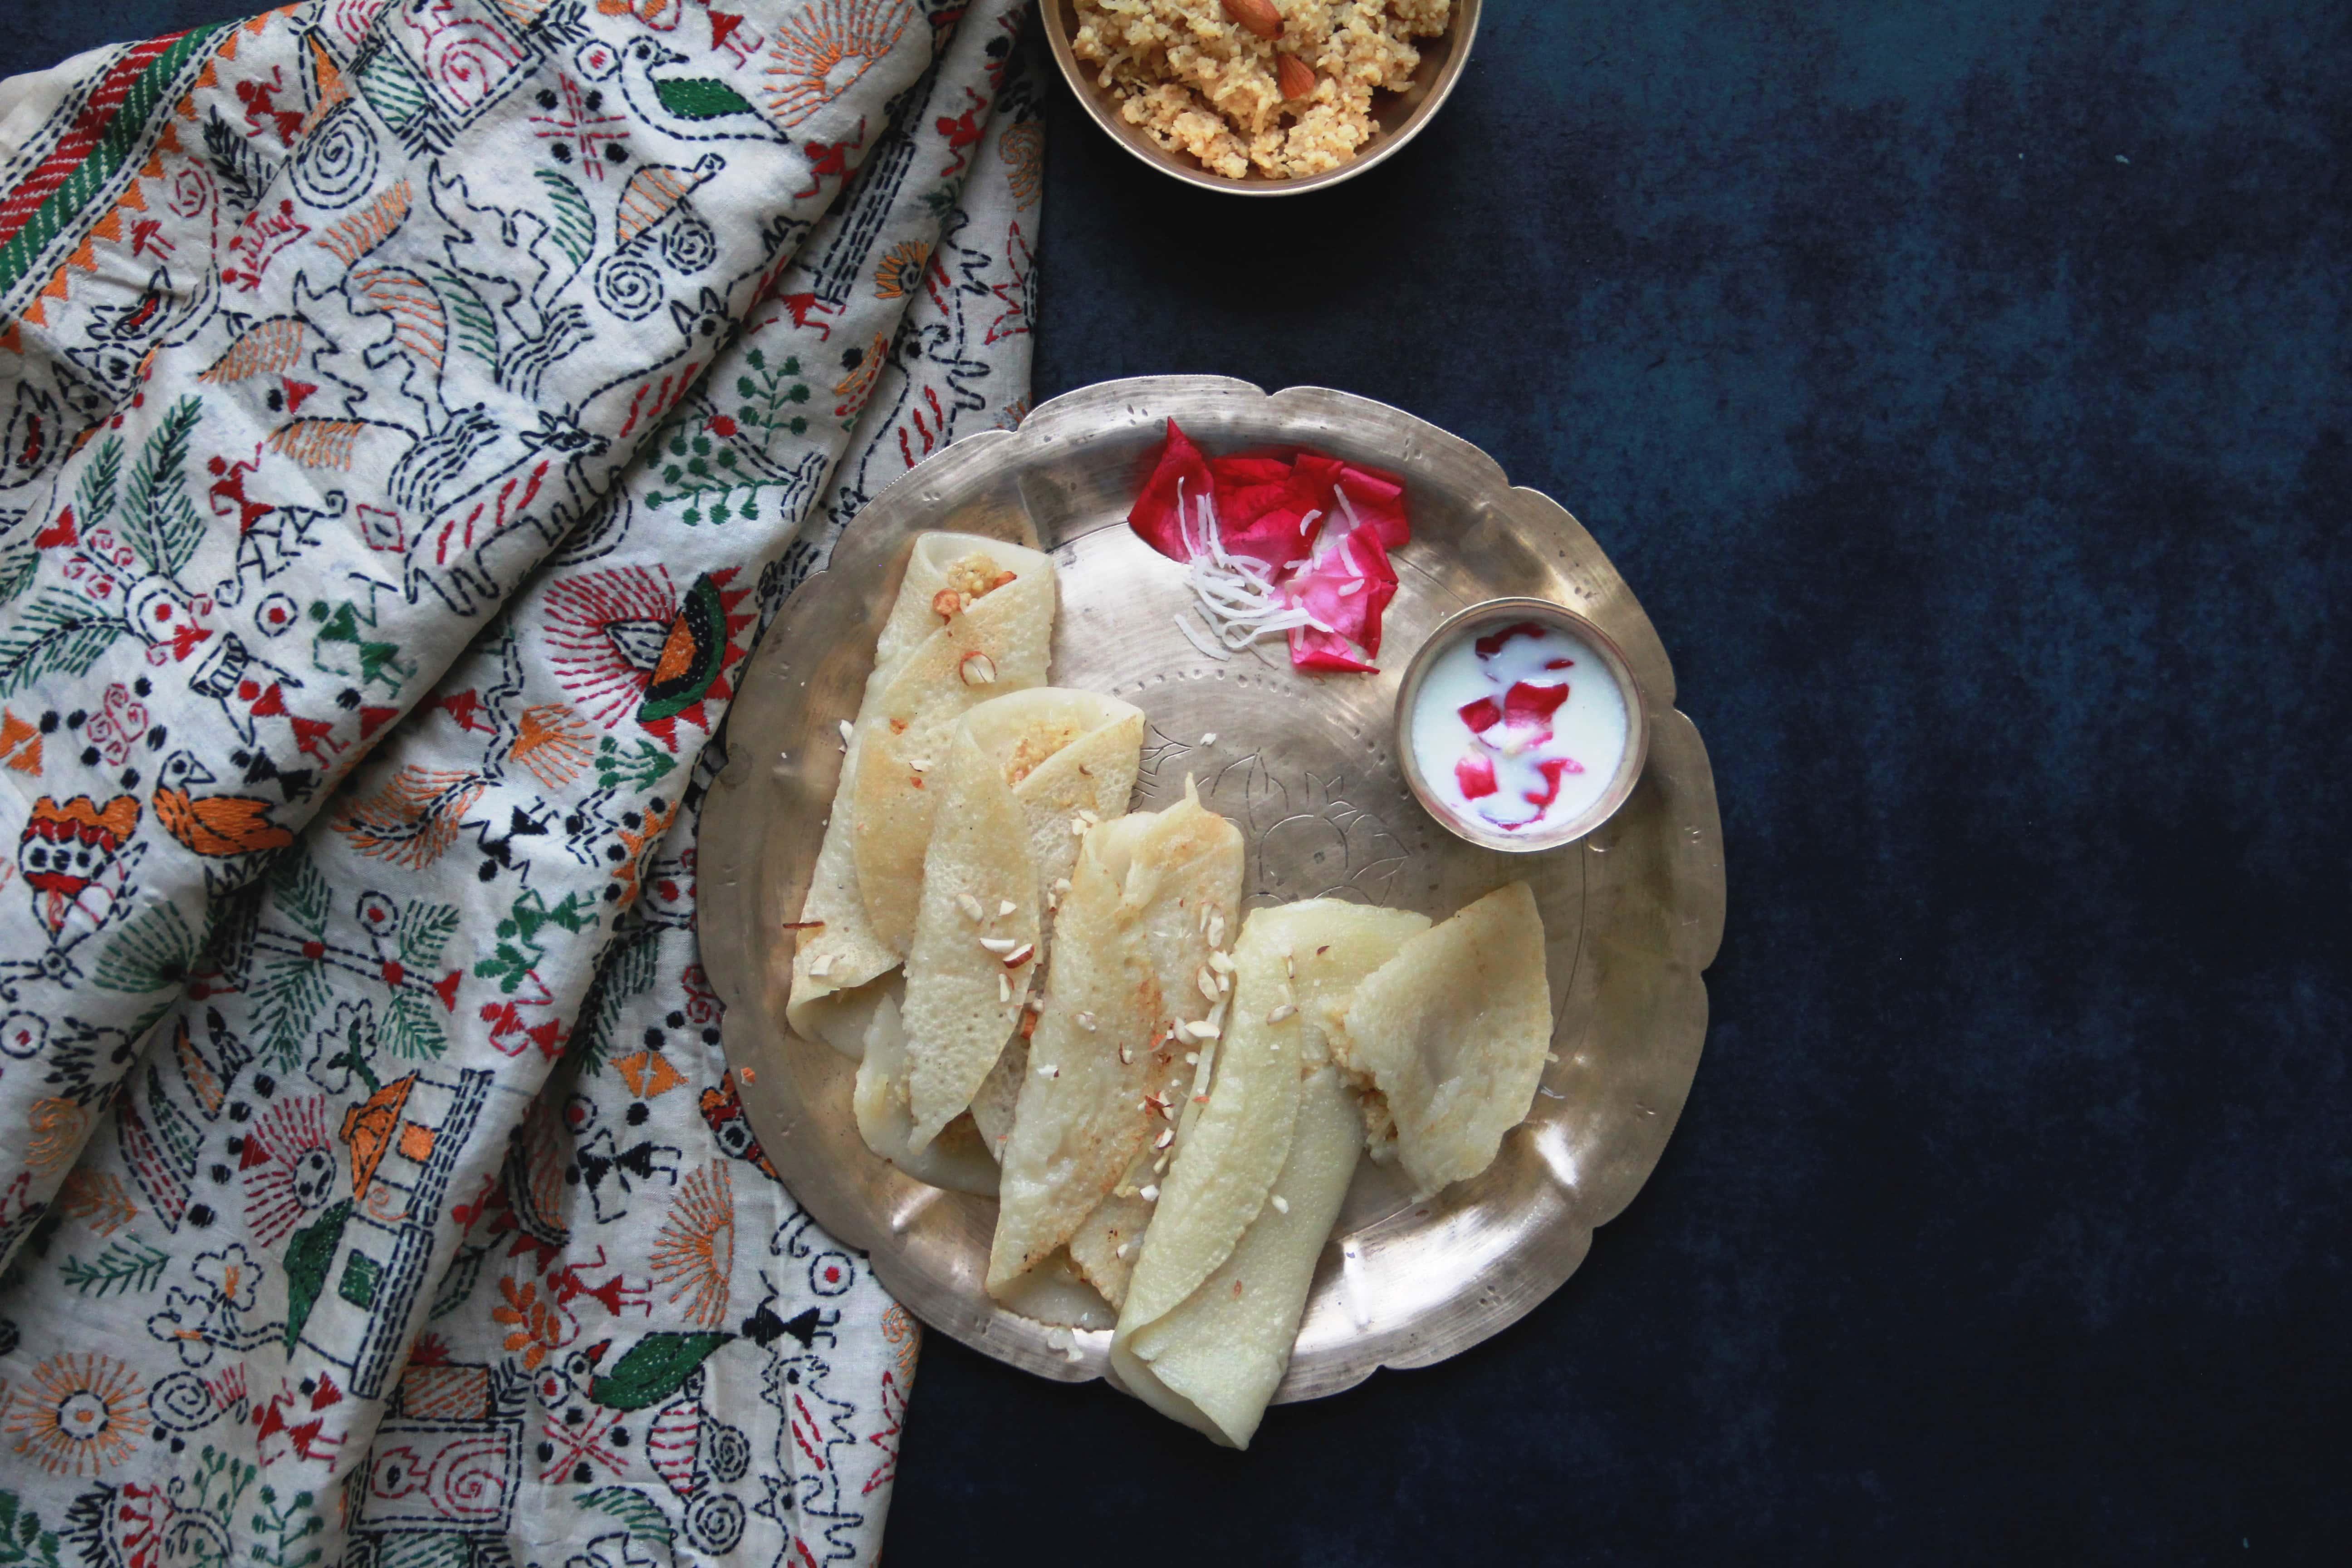 patishapta, fromthecornertable#fromthecornertable from the corner table, fromthecornertable, food blog, travel tuck-in talk, recipe, patishapta, pithe, bengali dessert, bengali food, bengali sweets, crêpe, Photo: Vaibhav Tanna